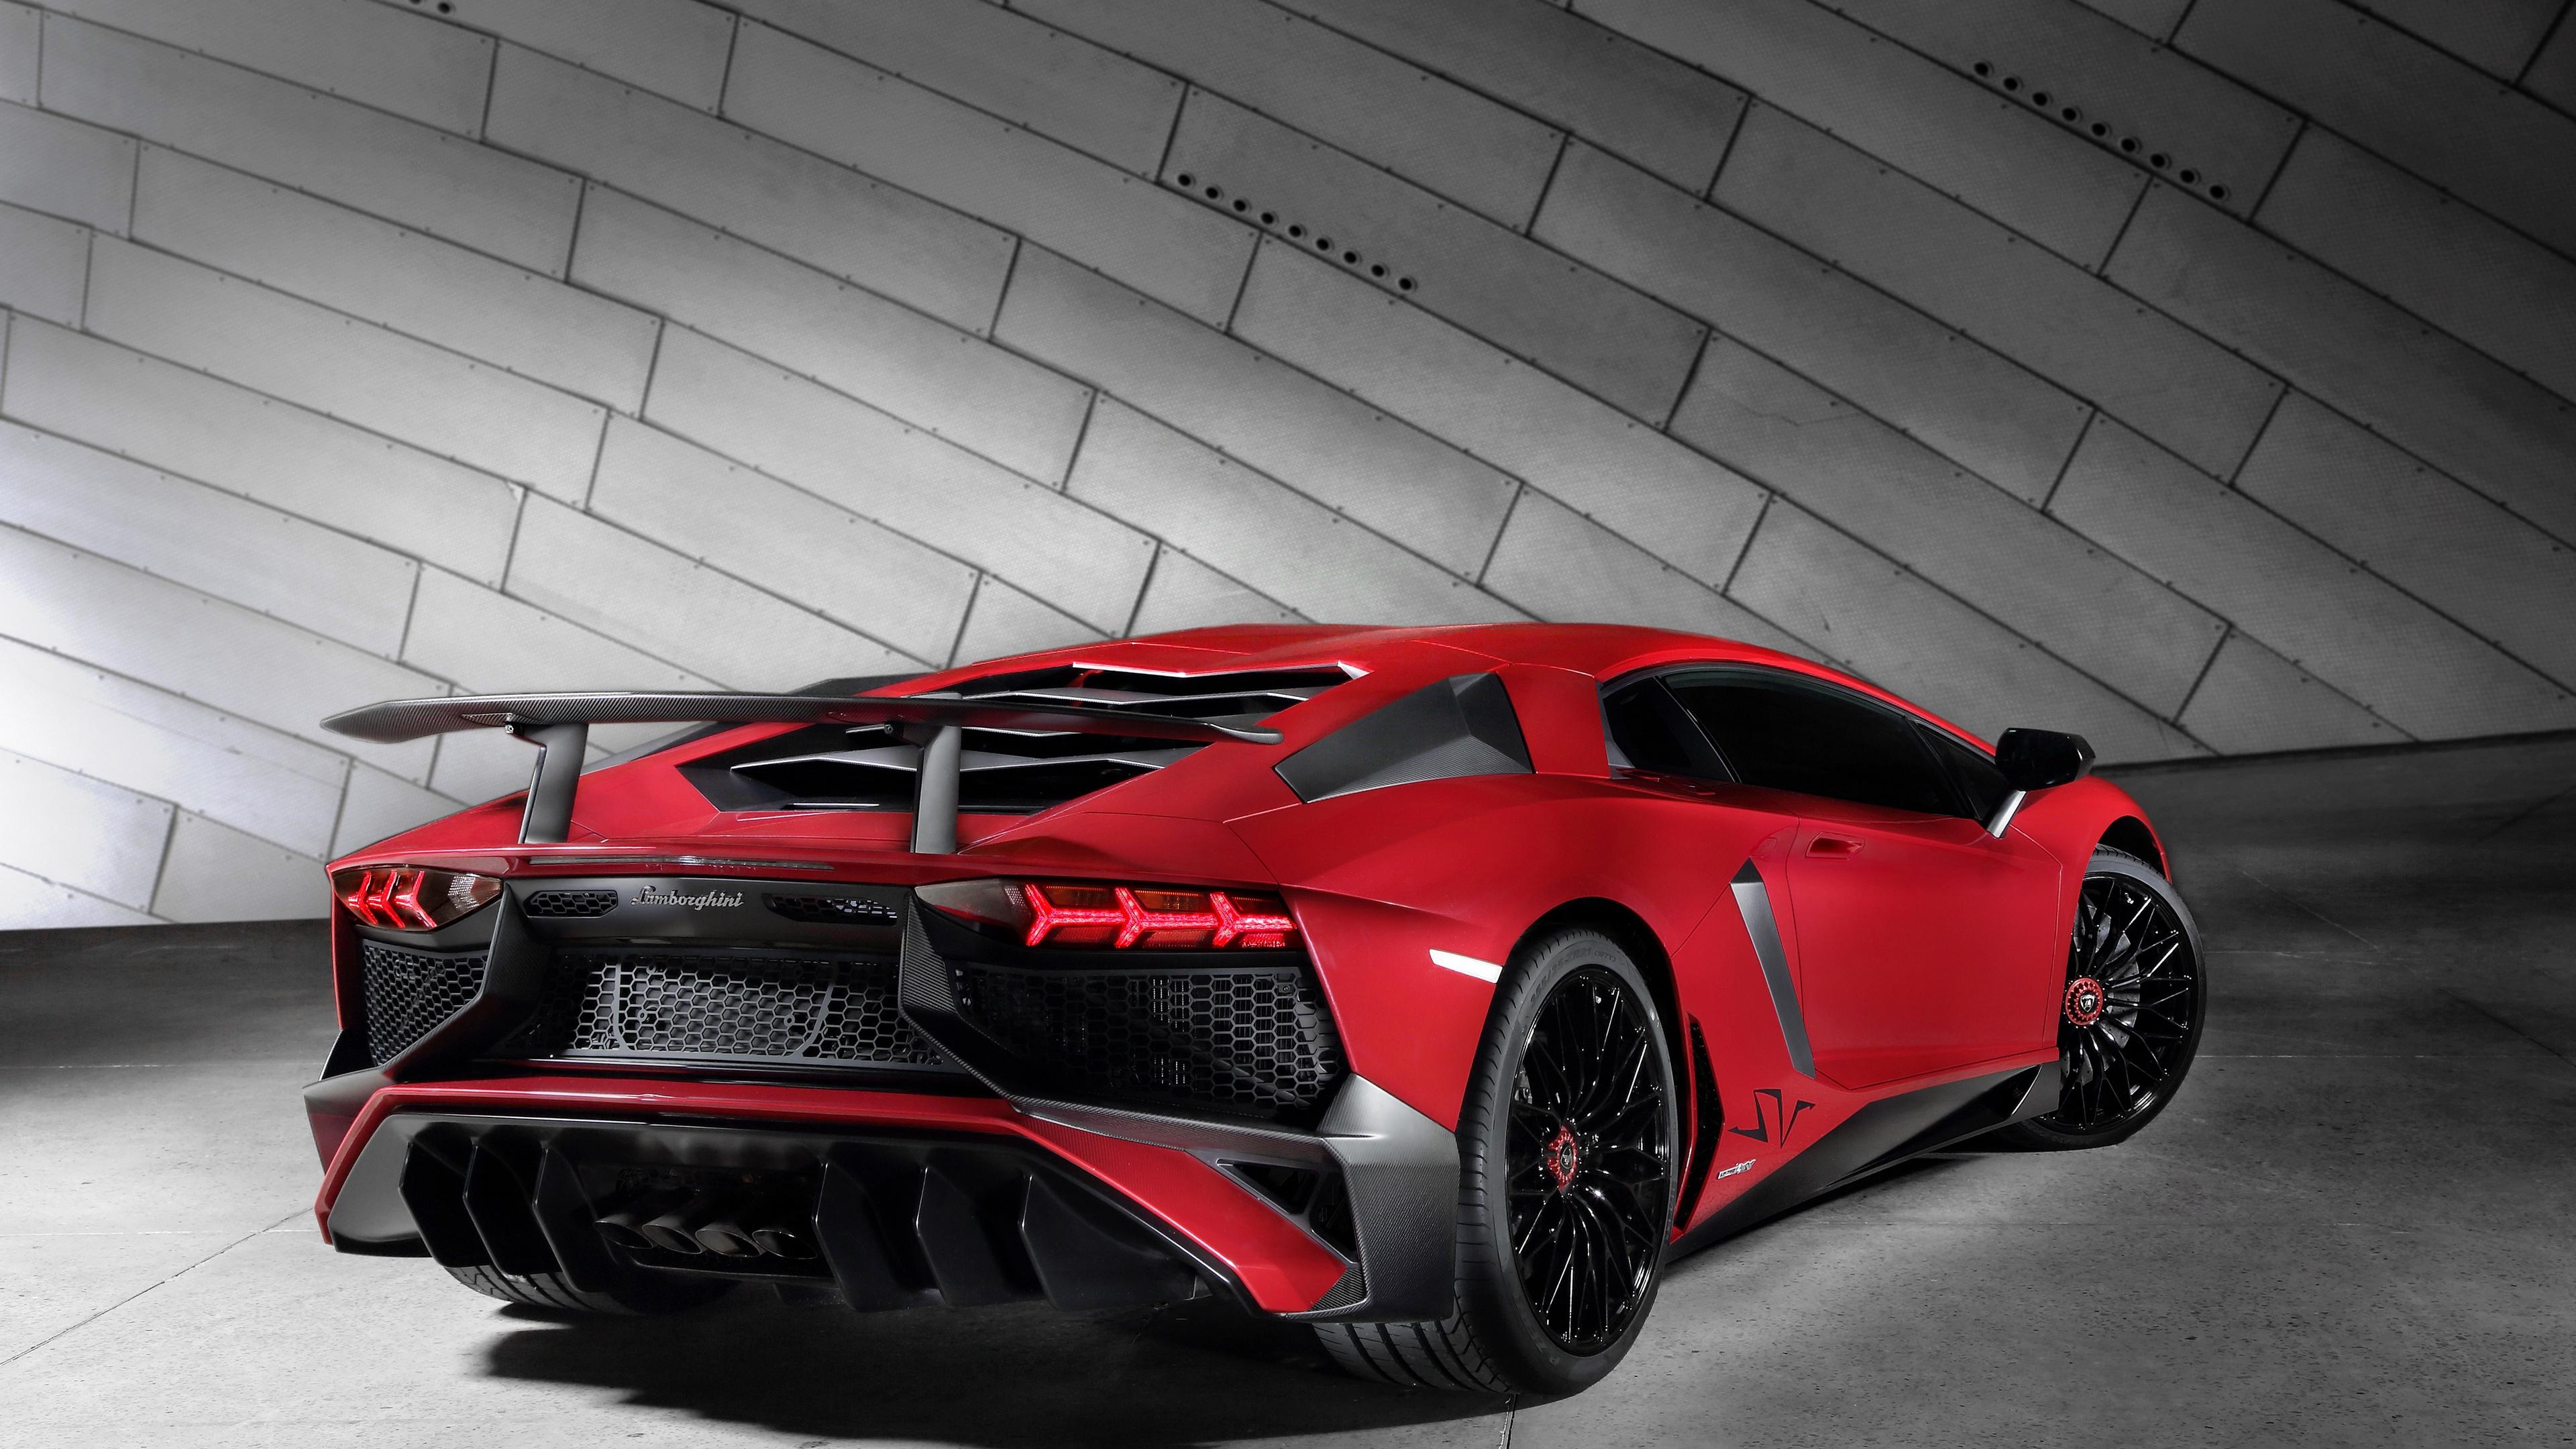 lamborghini aventador lp 750 4 2015 4k 1538937129 - lamborghini, aventador, lp 750-4, 2015 4k - lp 750-4, Lamborghini, Aventador